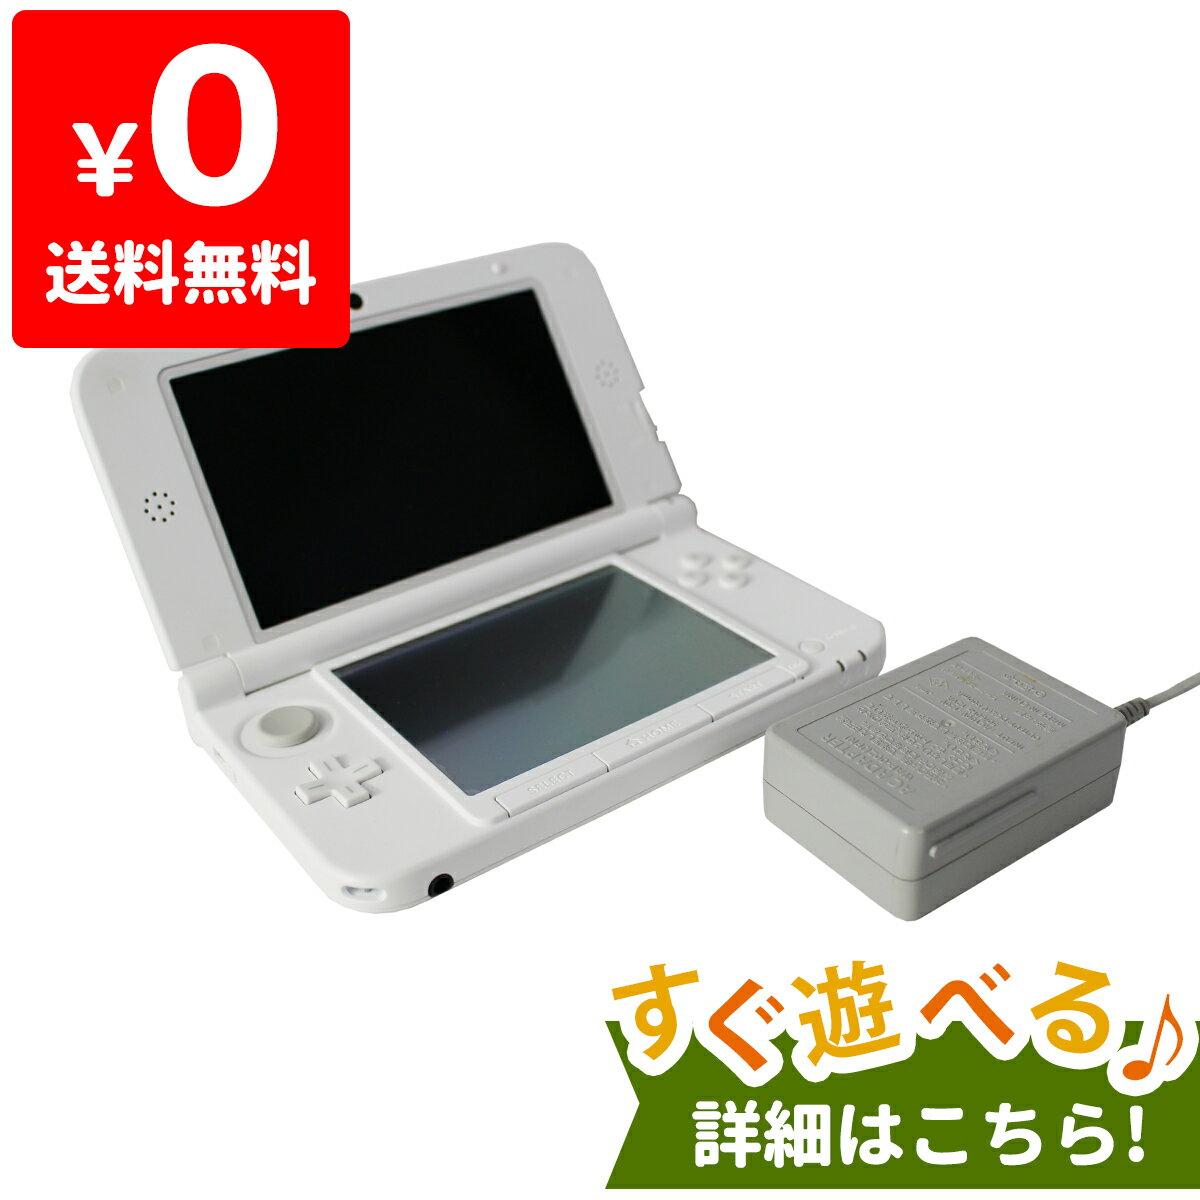 3DSLL ニンテンドー3DS LL ホワイト 本体 すぐ遊べるセット Nintendo 任天堂 ニンテンドー 中古 4902370519563 送料無料 【中古】